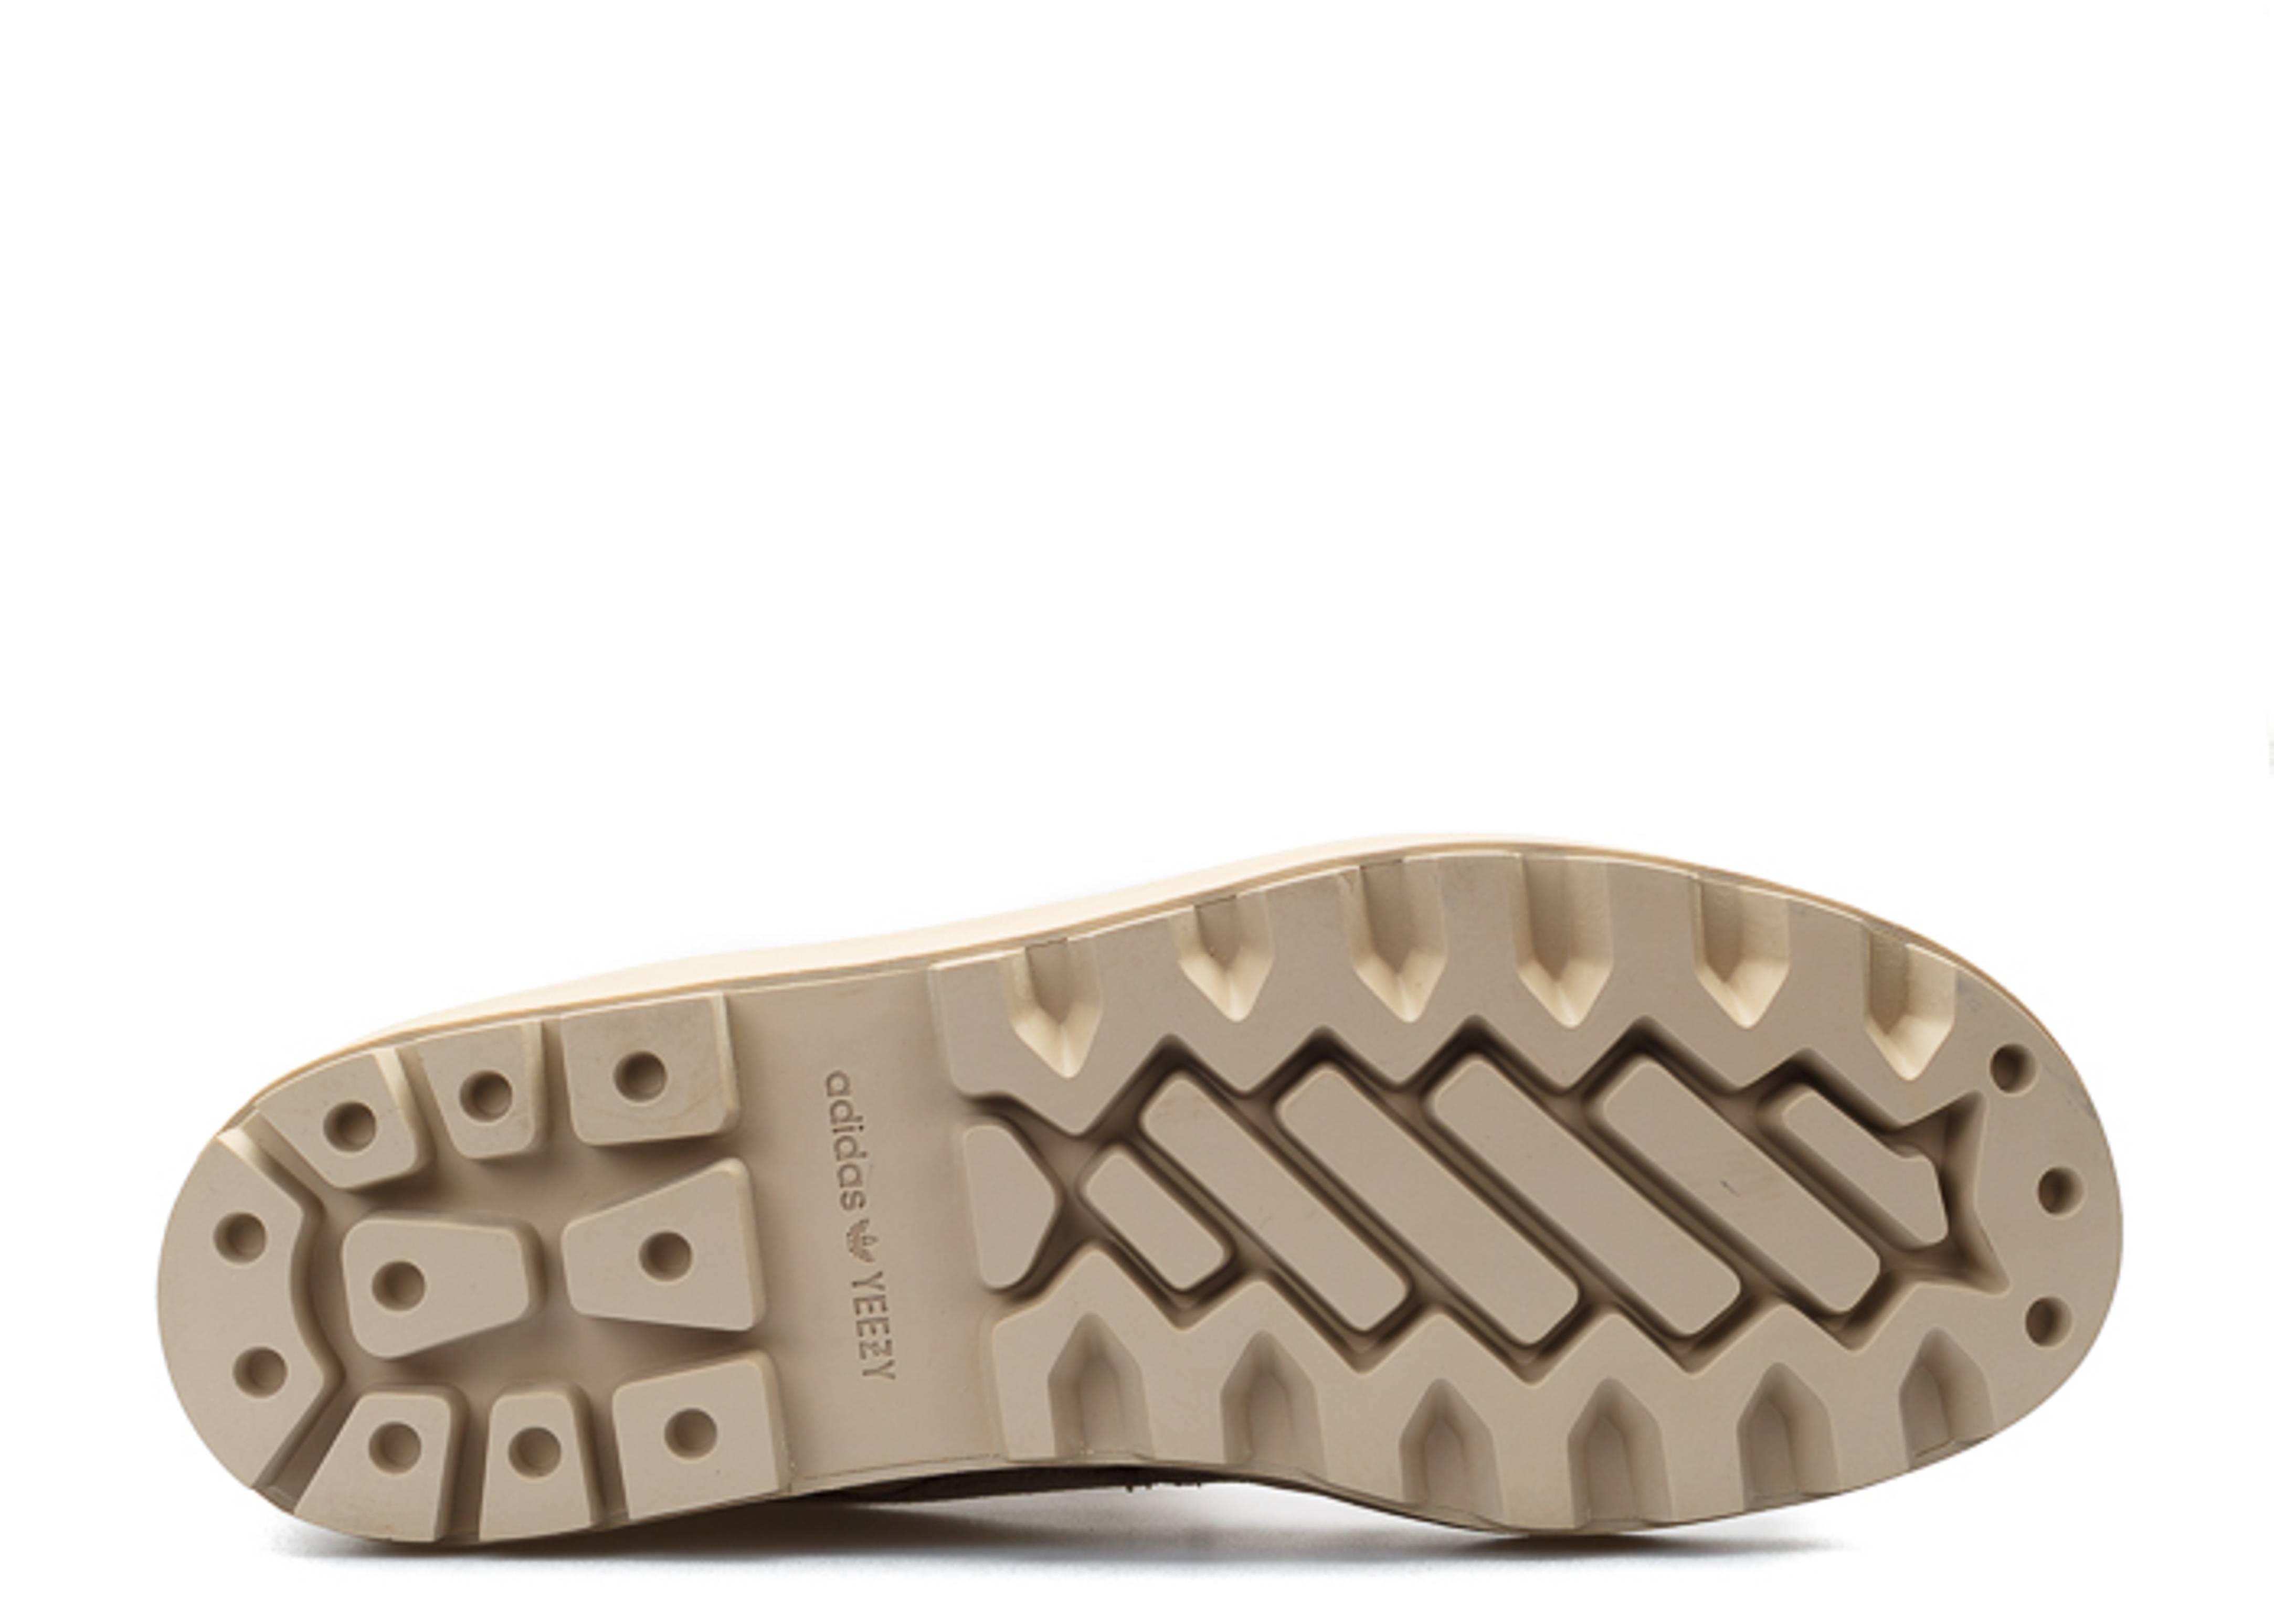 adidas Yeezy Boost 350 V2 'Peyote' Sample Sneaker News